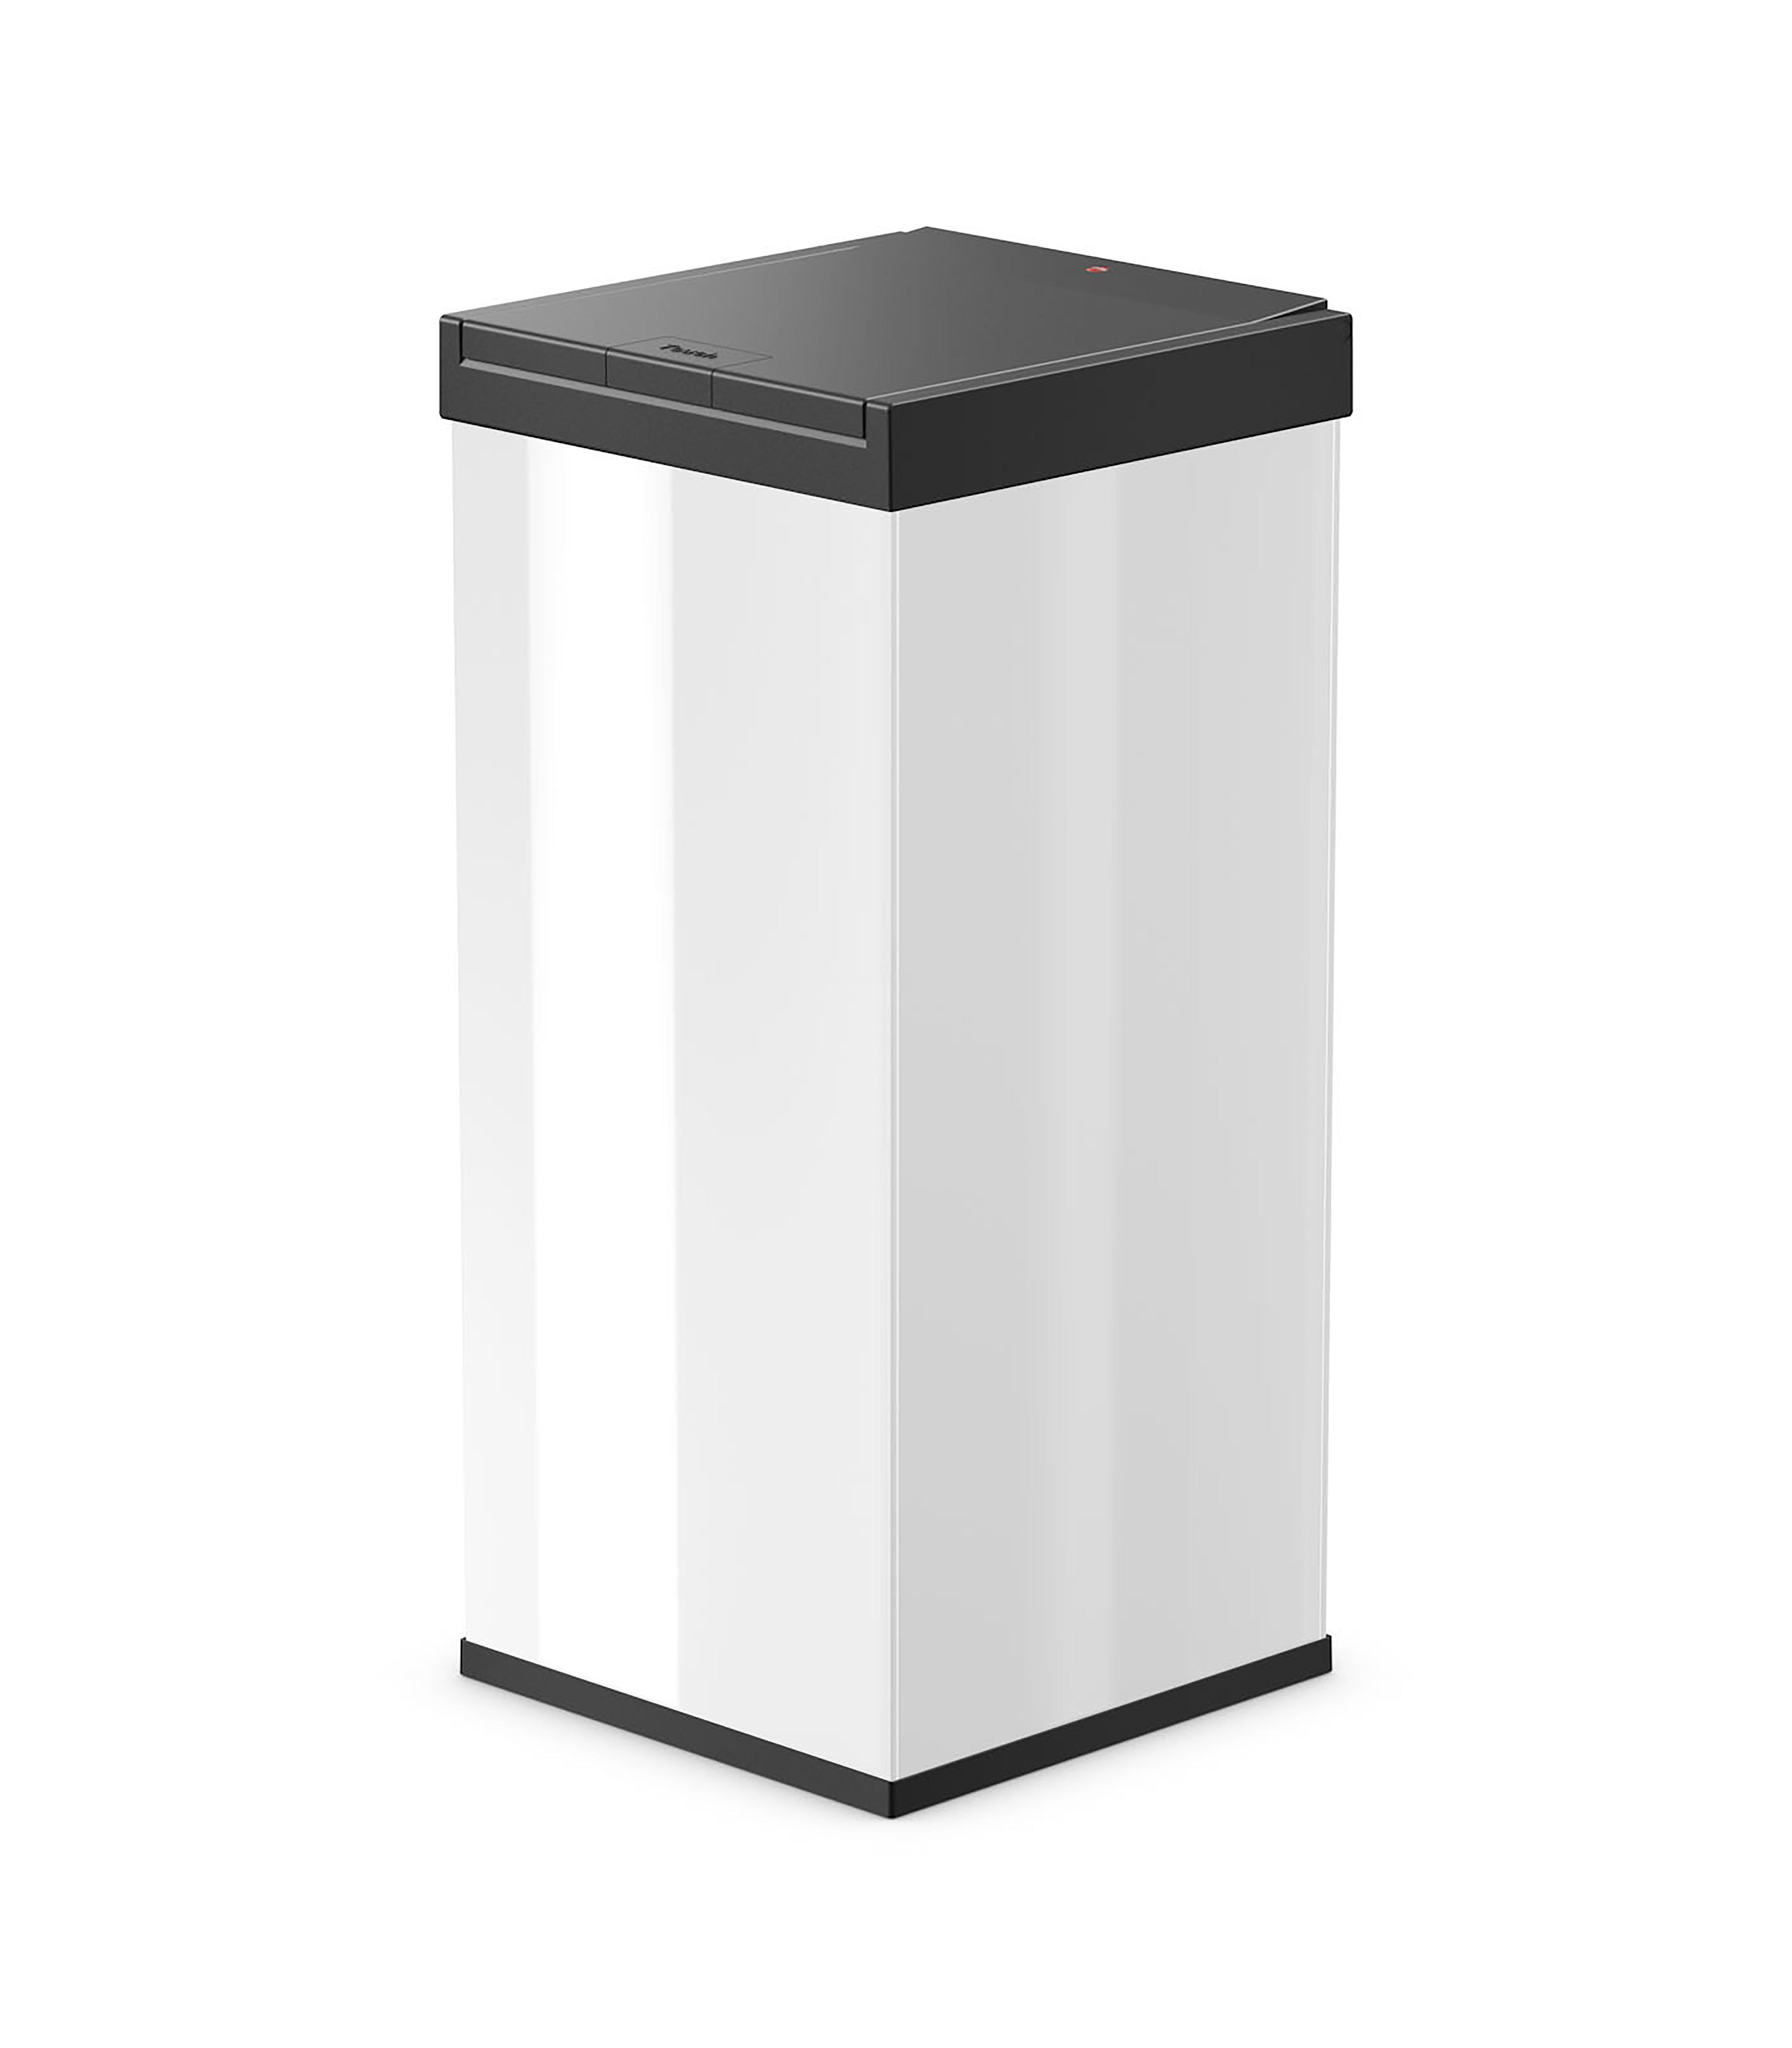 Hailo Usa Inc Box 80 18 7 Gallon Touch Top Trash Can Reviews Wayfair